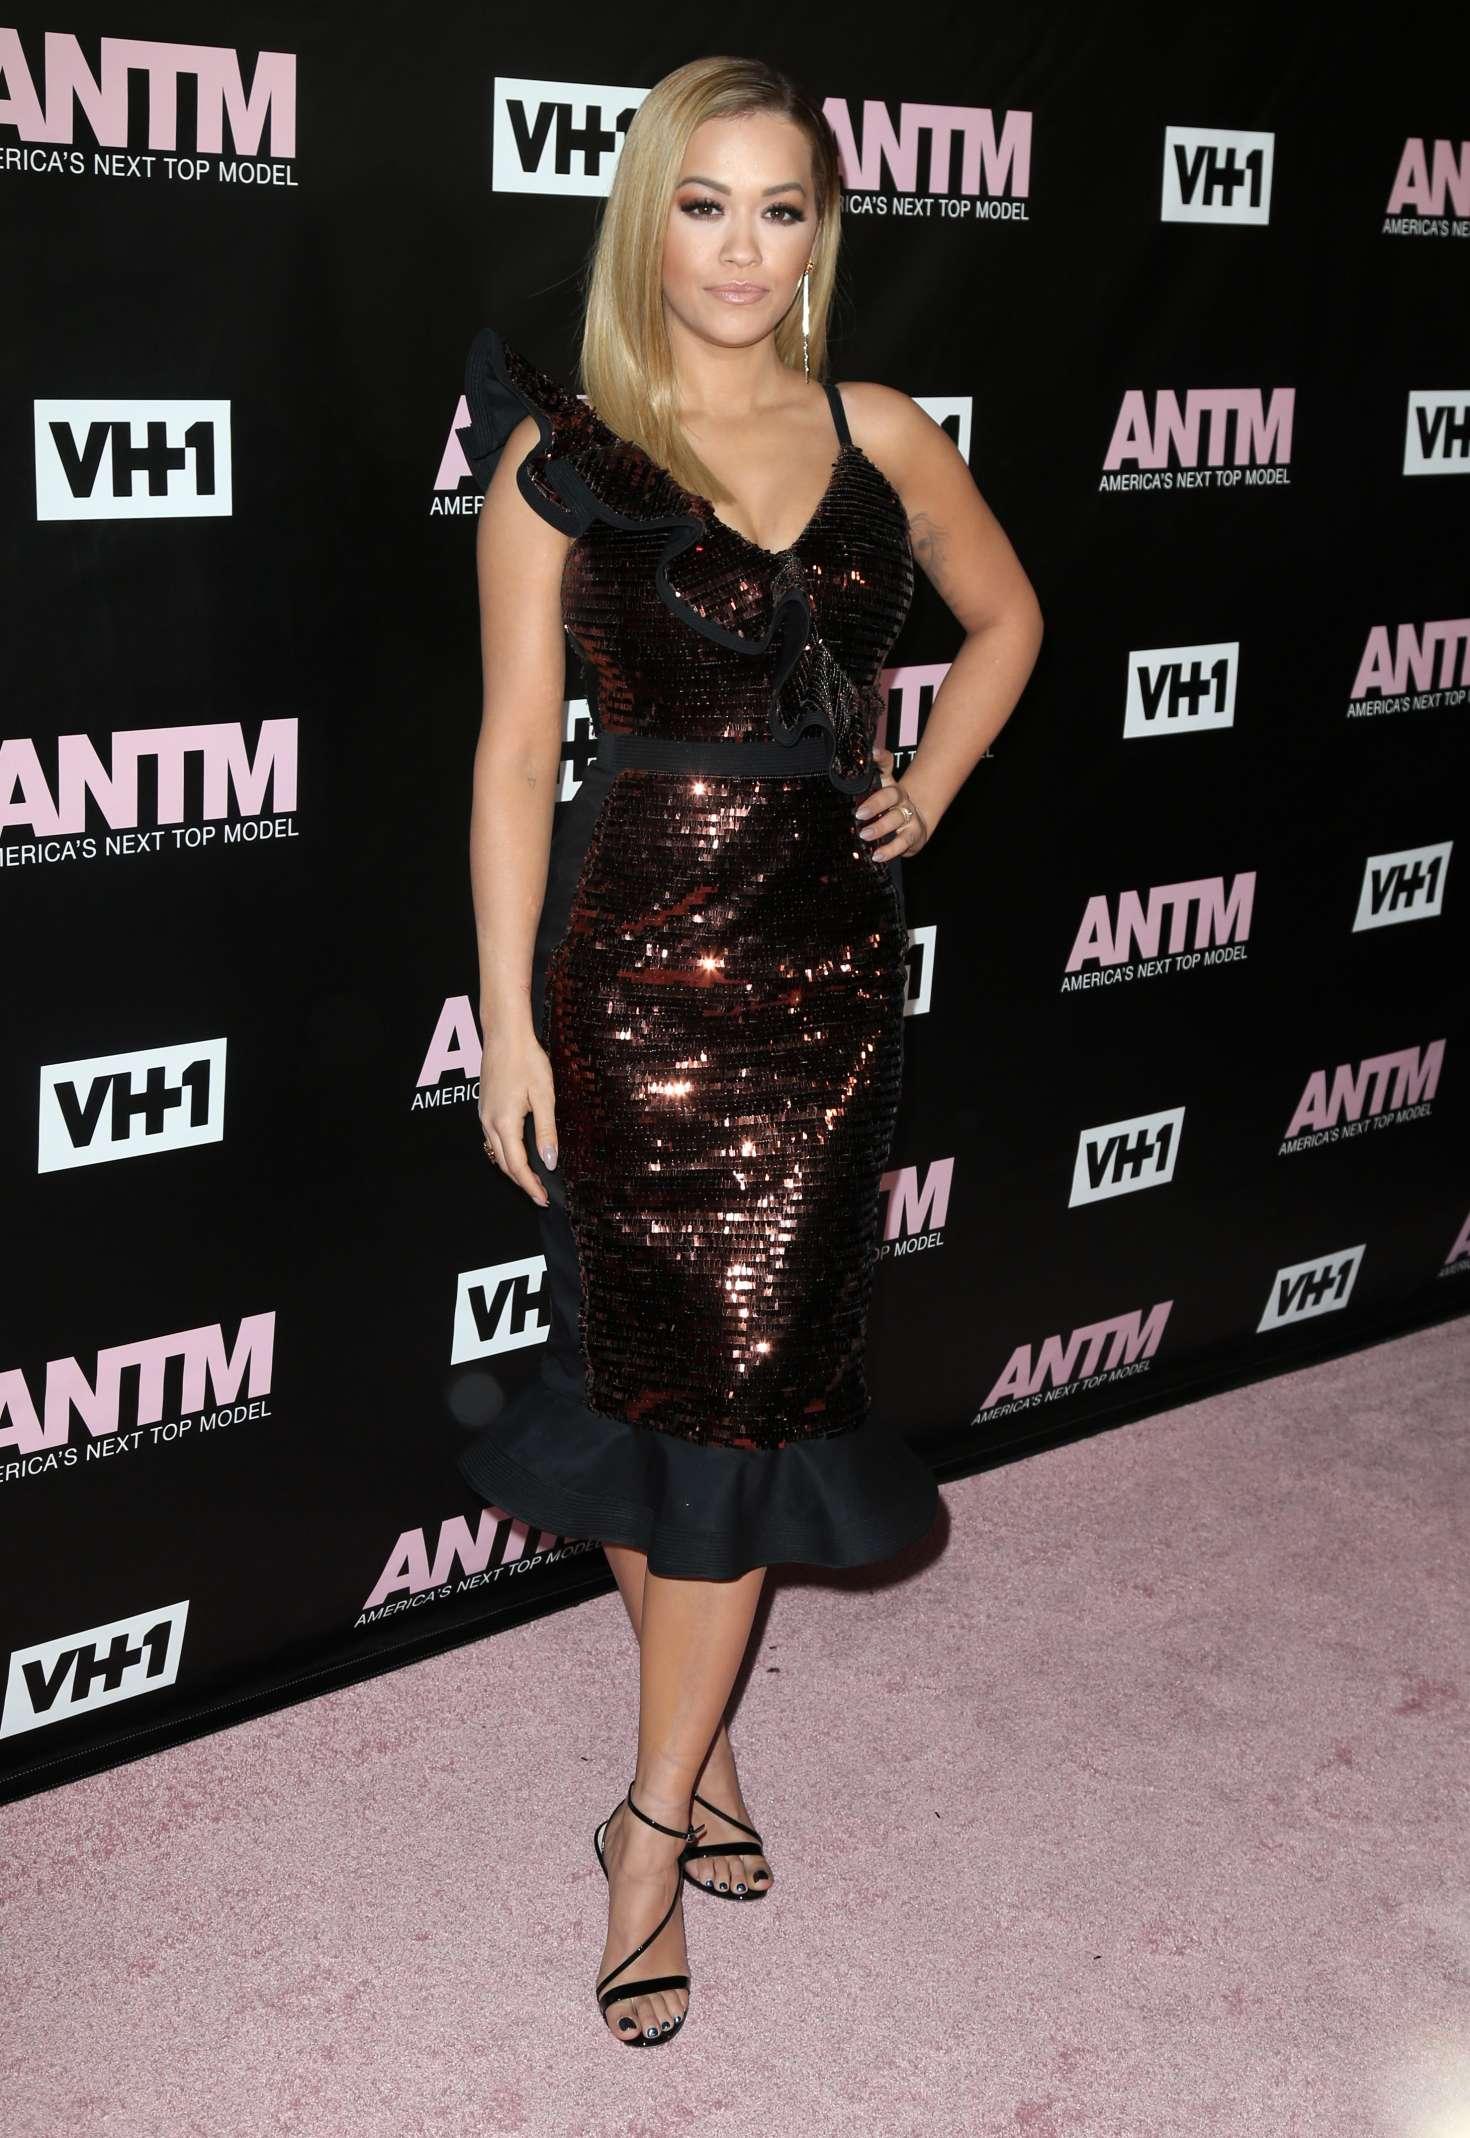 Rita Ora 2016 : Rita Ora: Americas Next Top Model Premiere Party -20